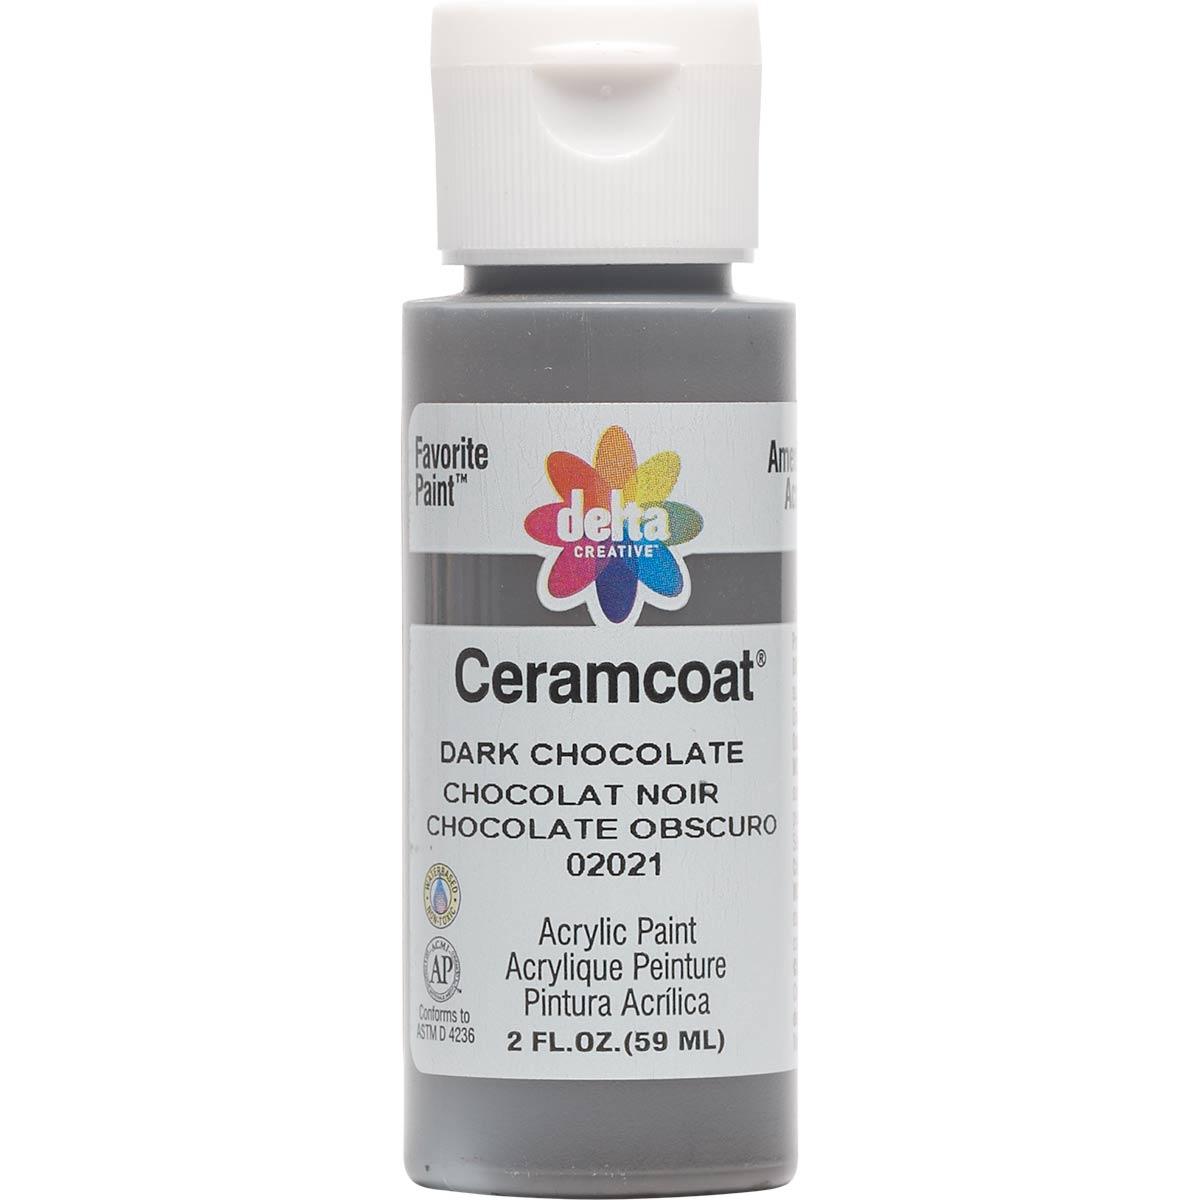 Delta Ceramcoat ® Acrylic Paint - Dark Chocolate, 2 oz.